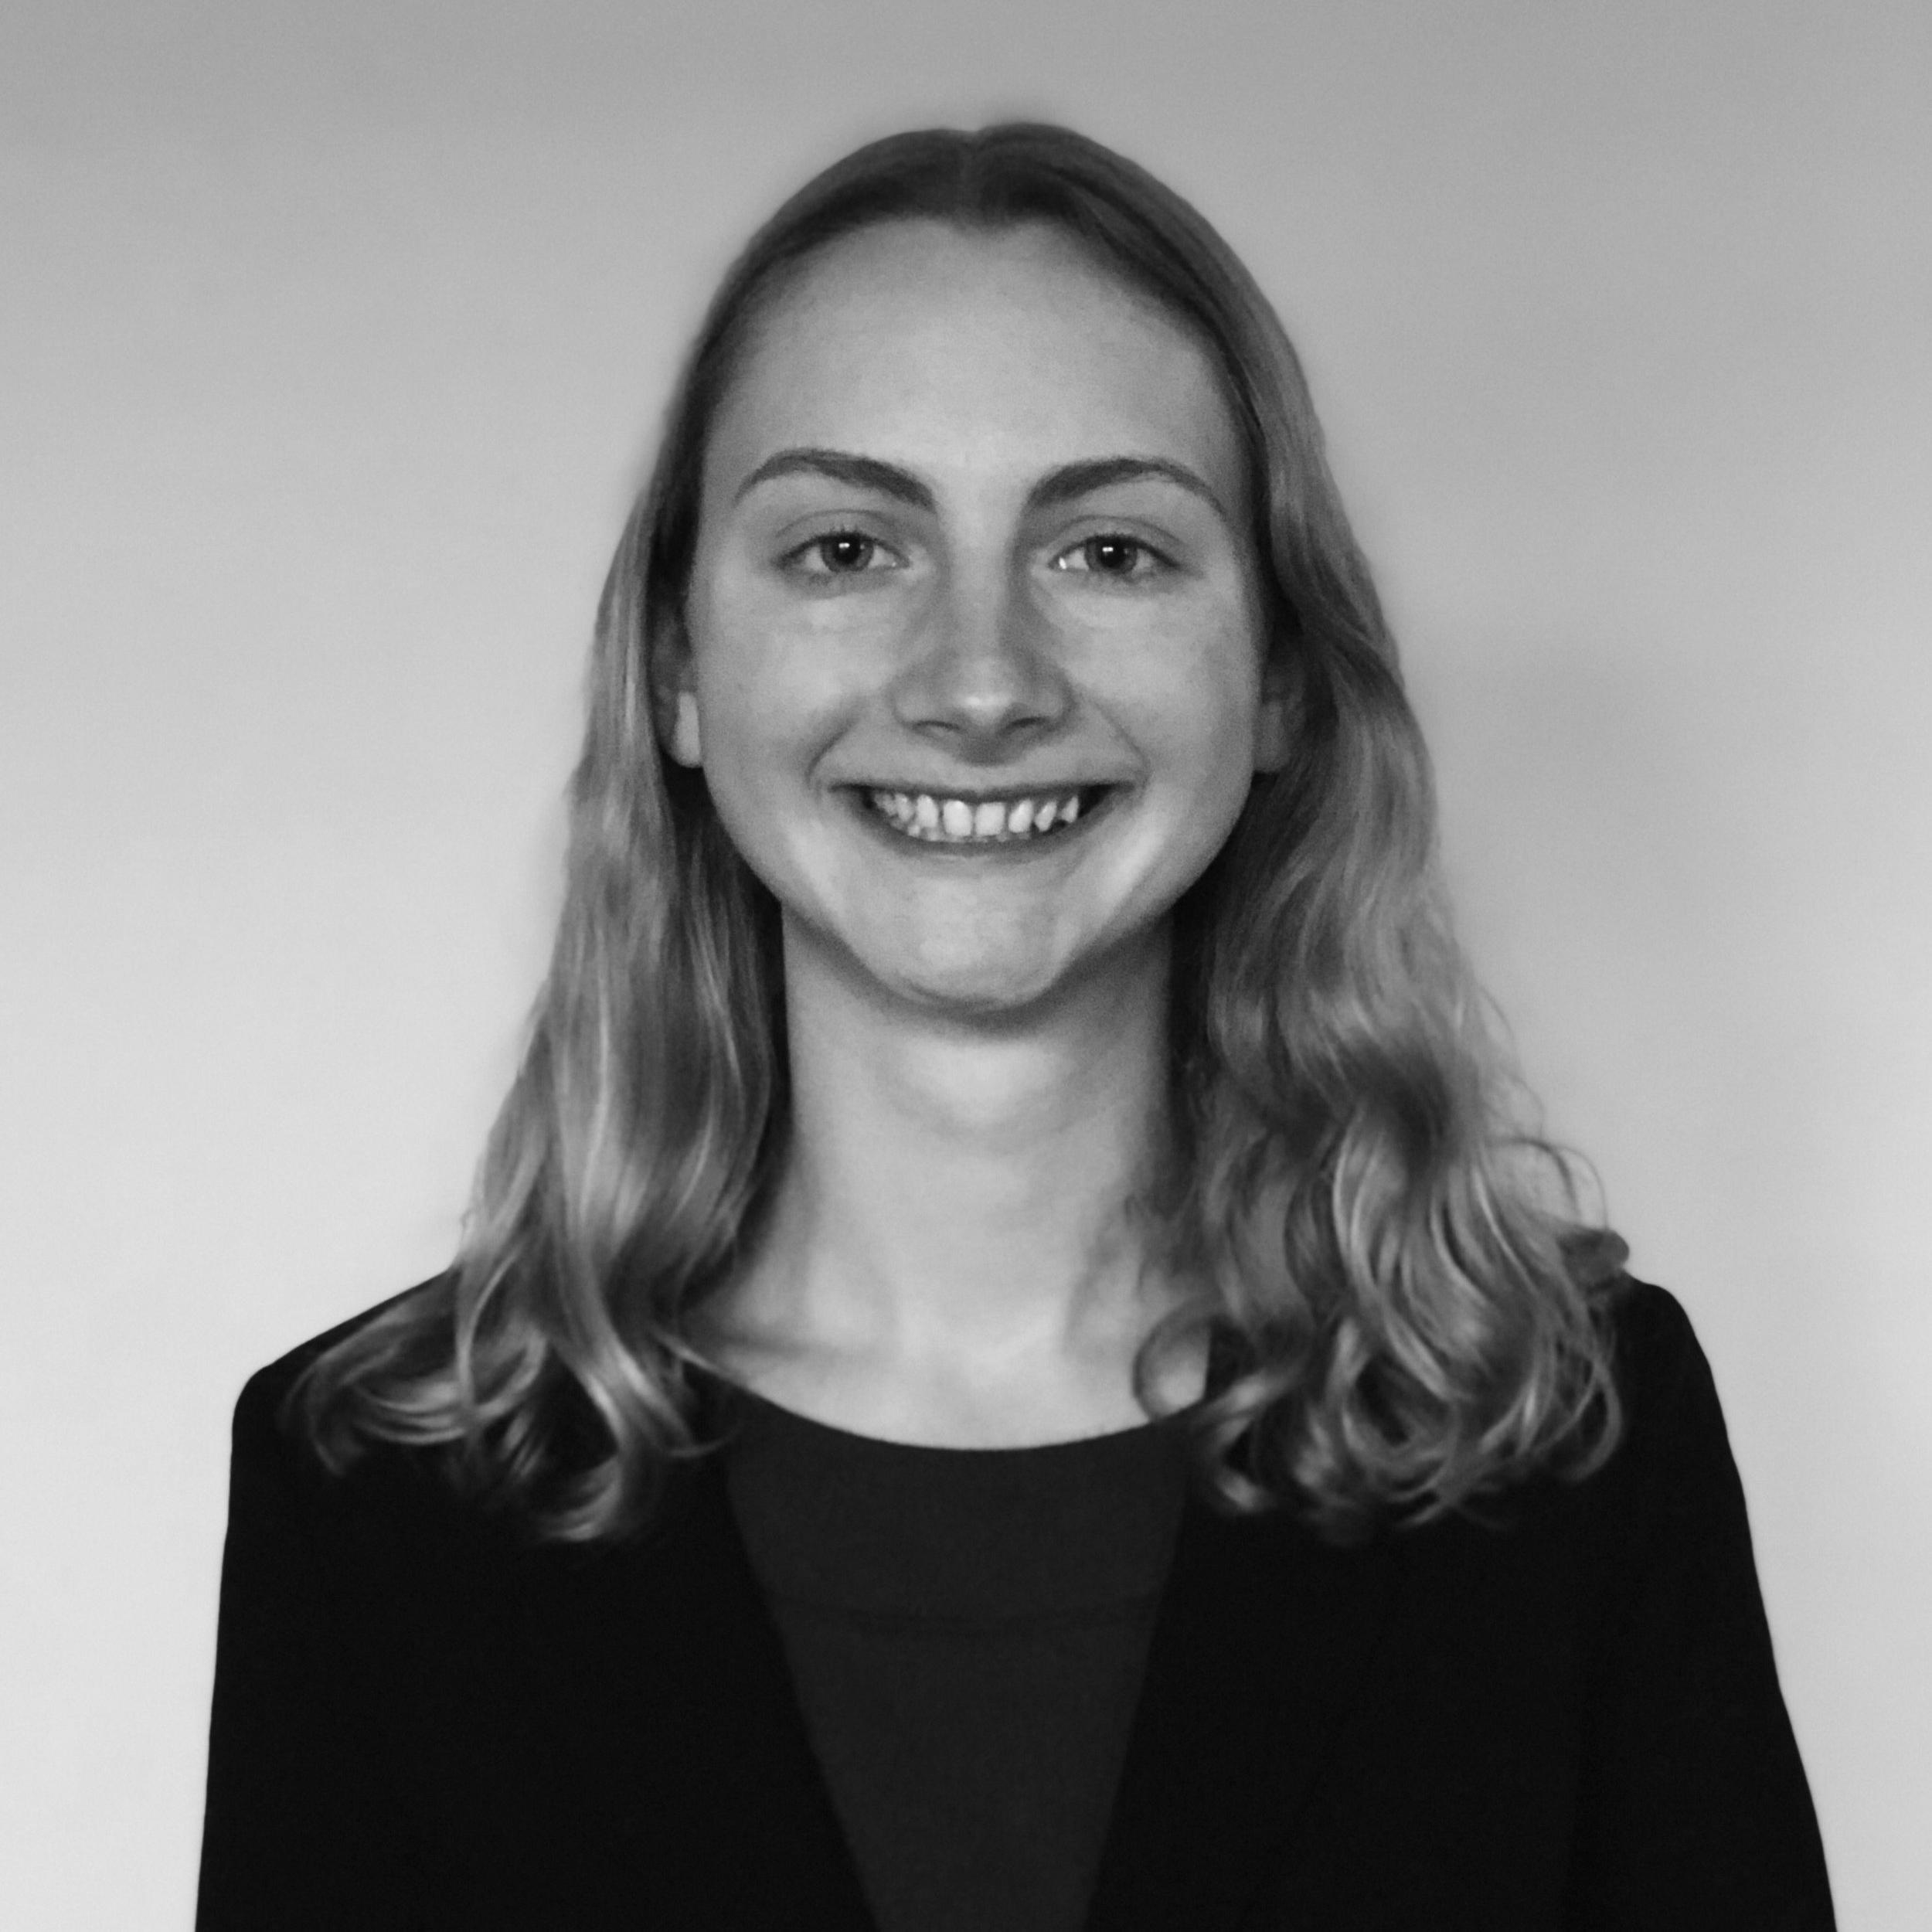 Victoria Grabinski   Student Research Assistant St. Louis, MO